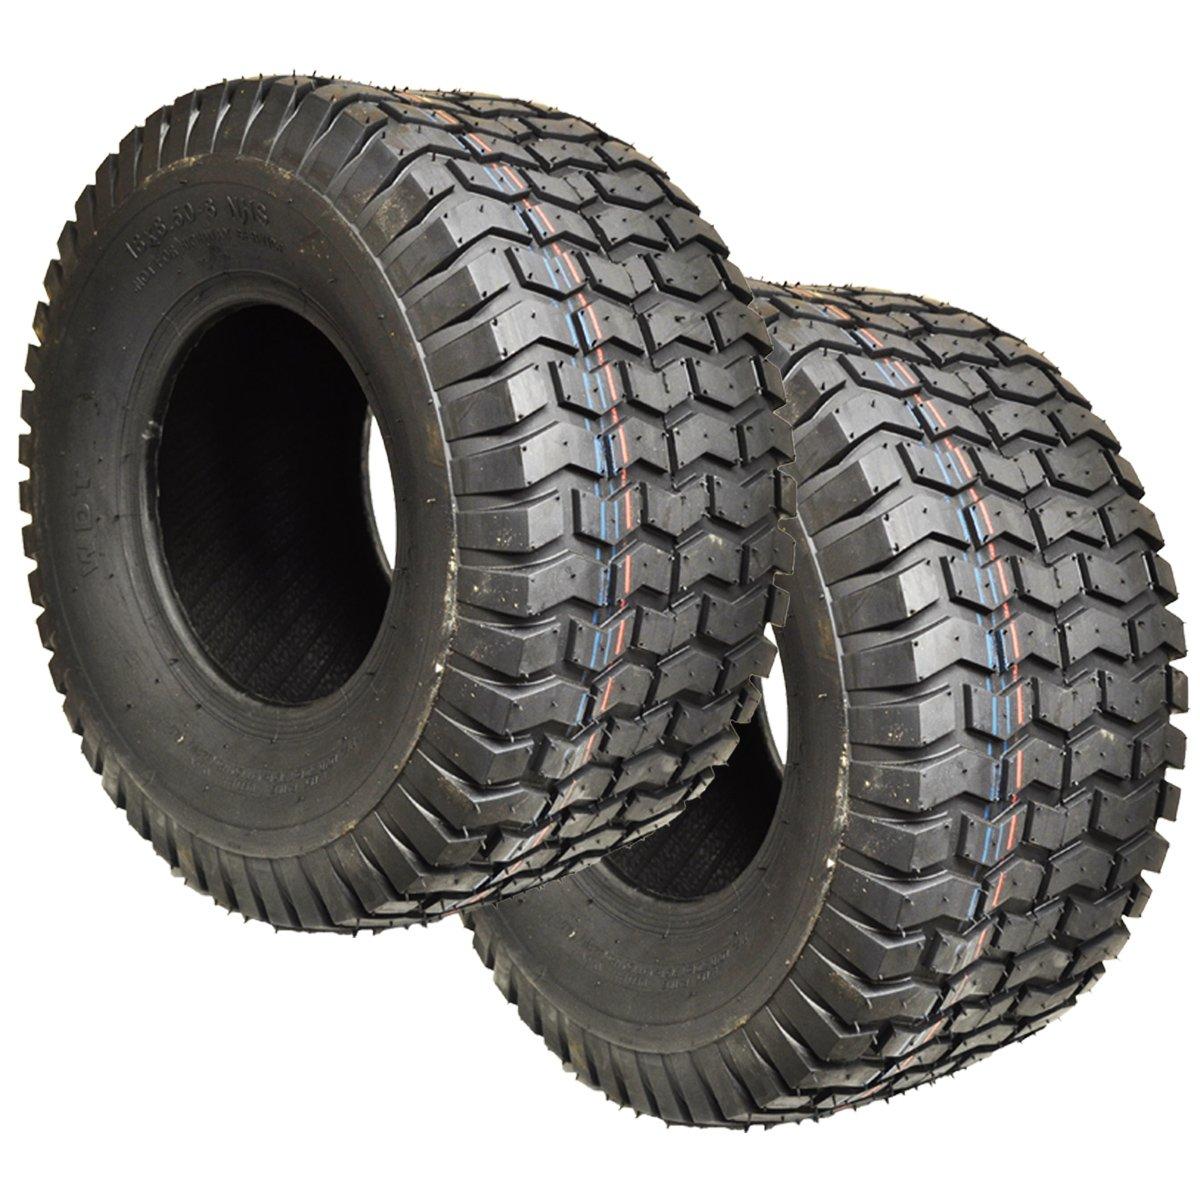 Replaces Toro 2PK Lawn & Garden Turf Saver Tire 20x8-8 20x8.00-8 20x8x8 Tire